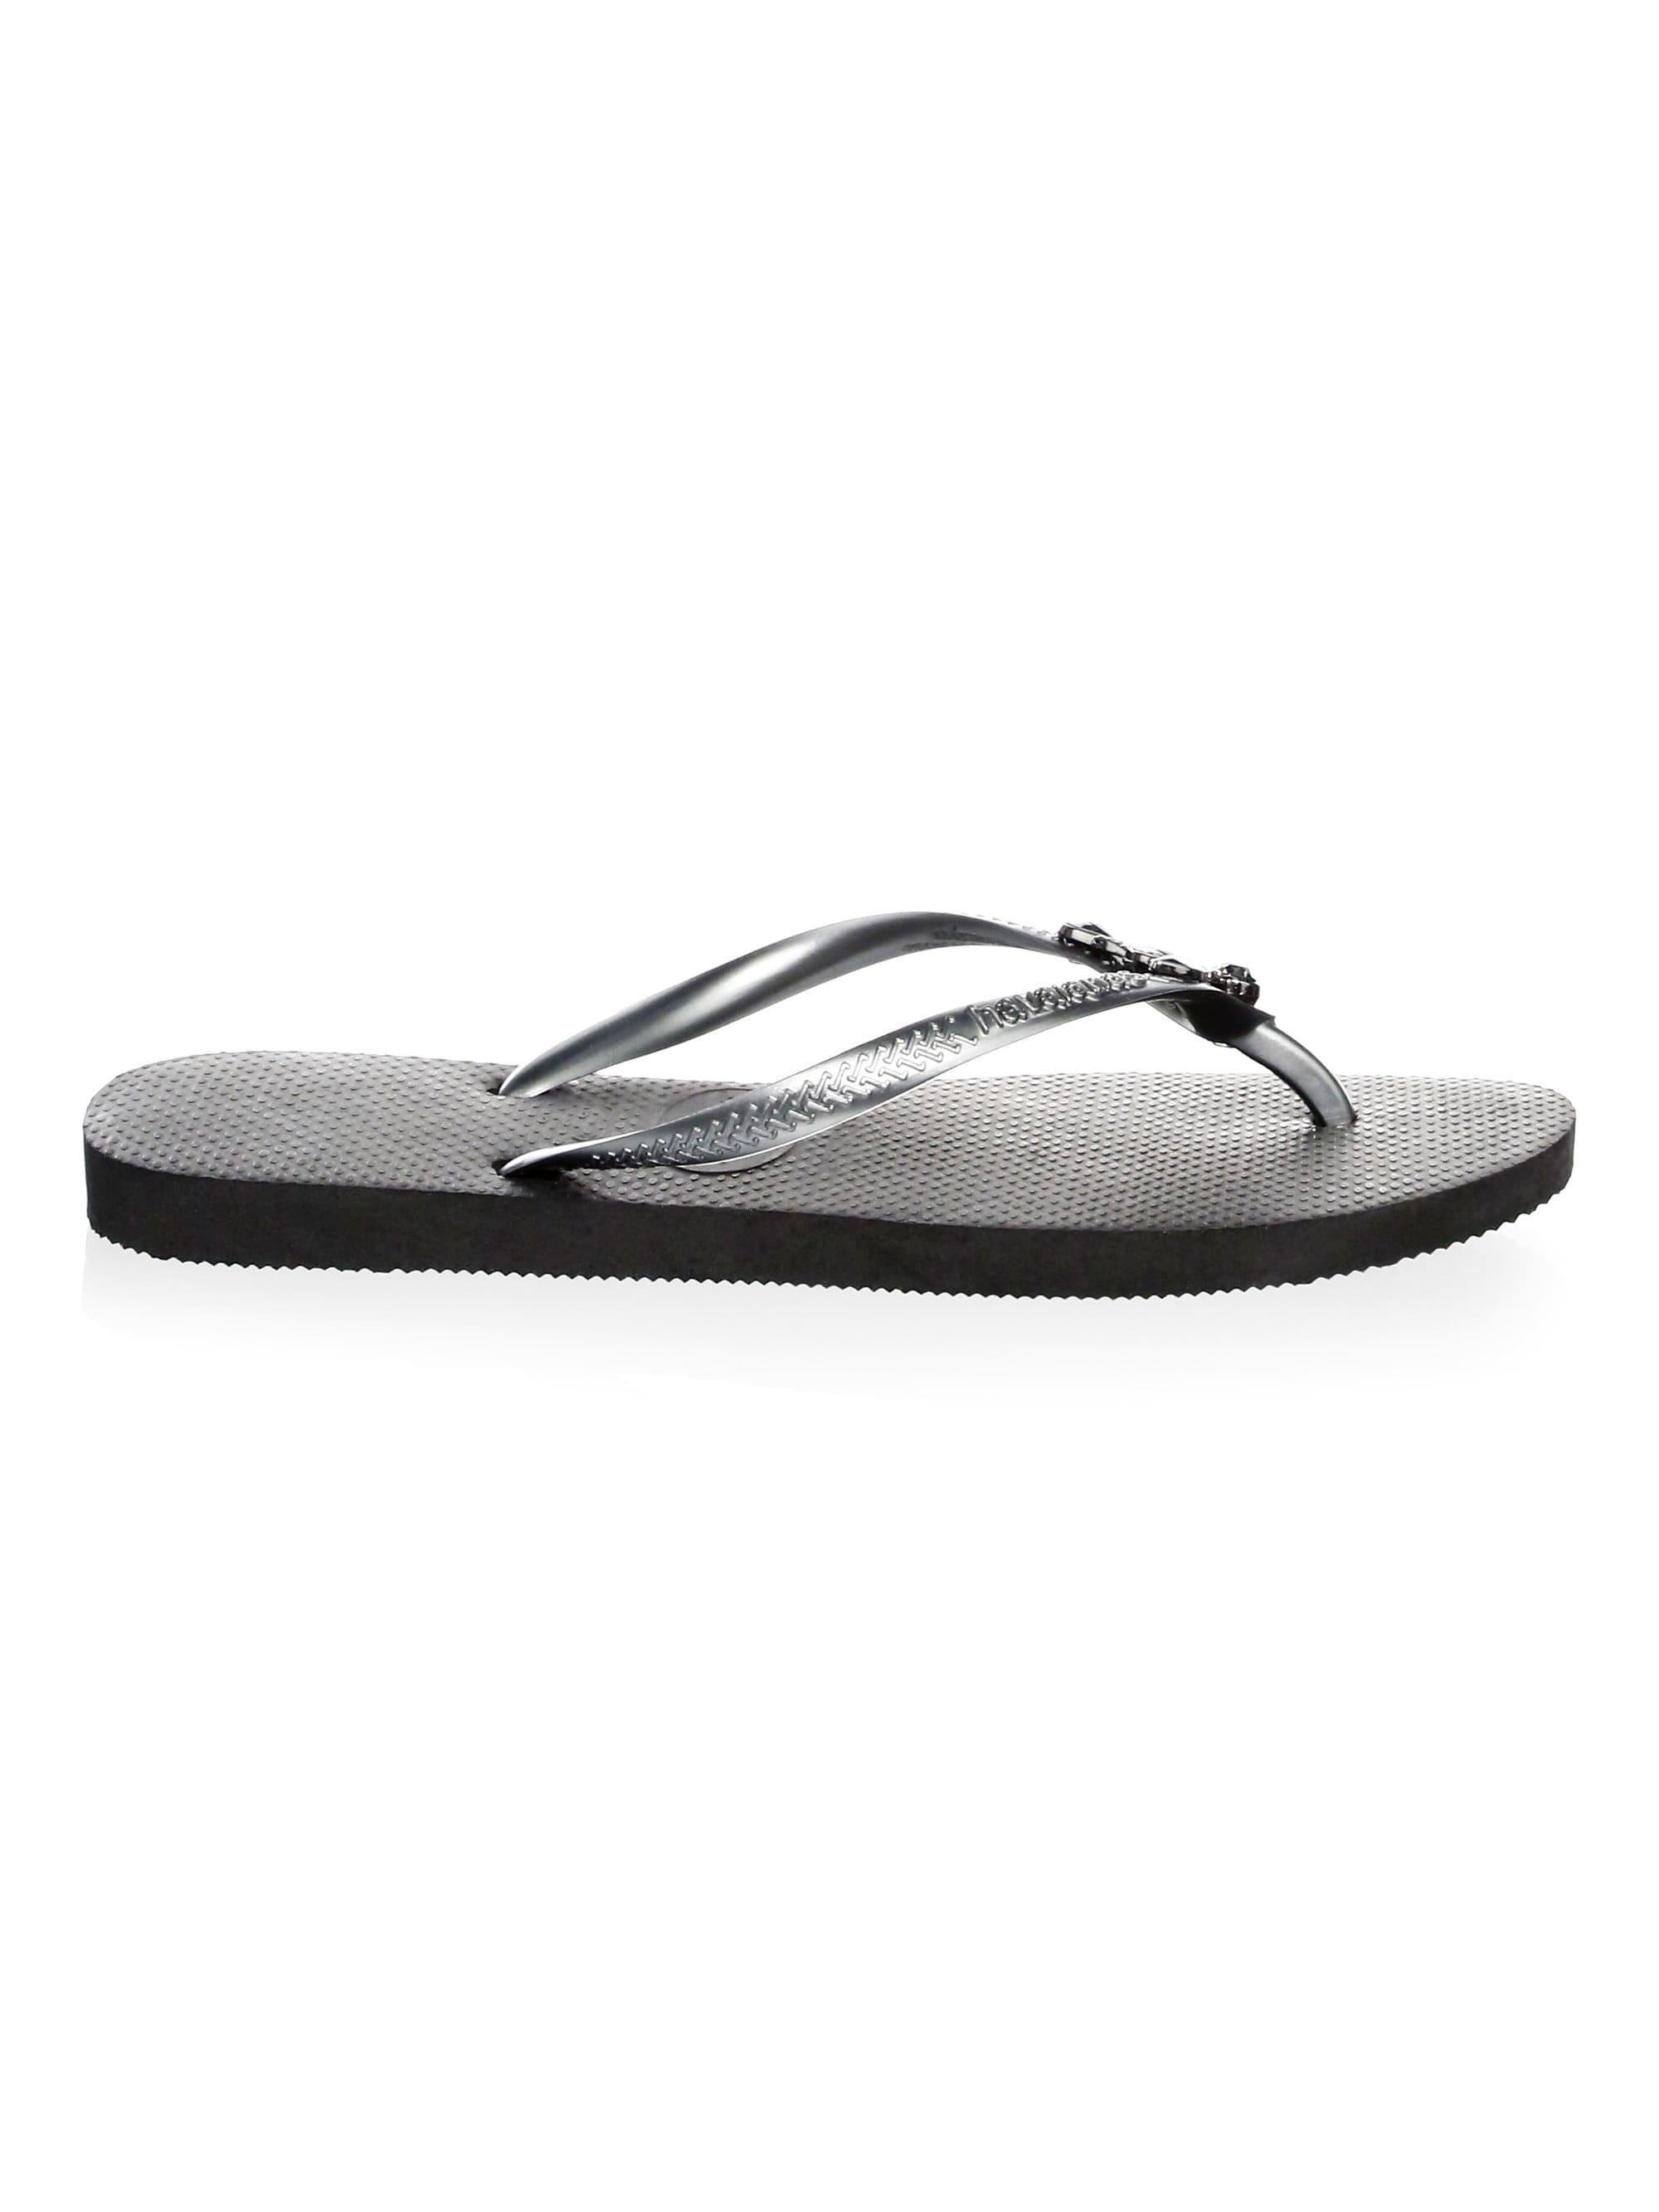 9090f3d6f095ad Havaianas - Black Women s Slim Lux Swarovski Crystal Flip Flops - Sand -  Size 39-